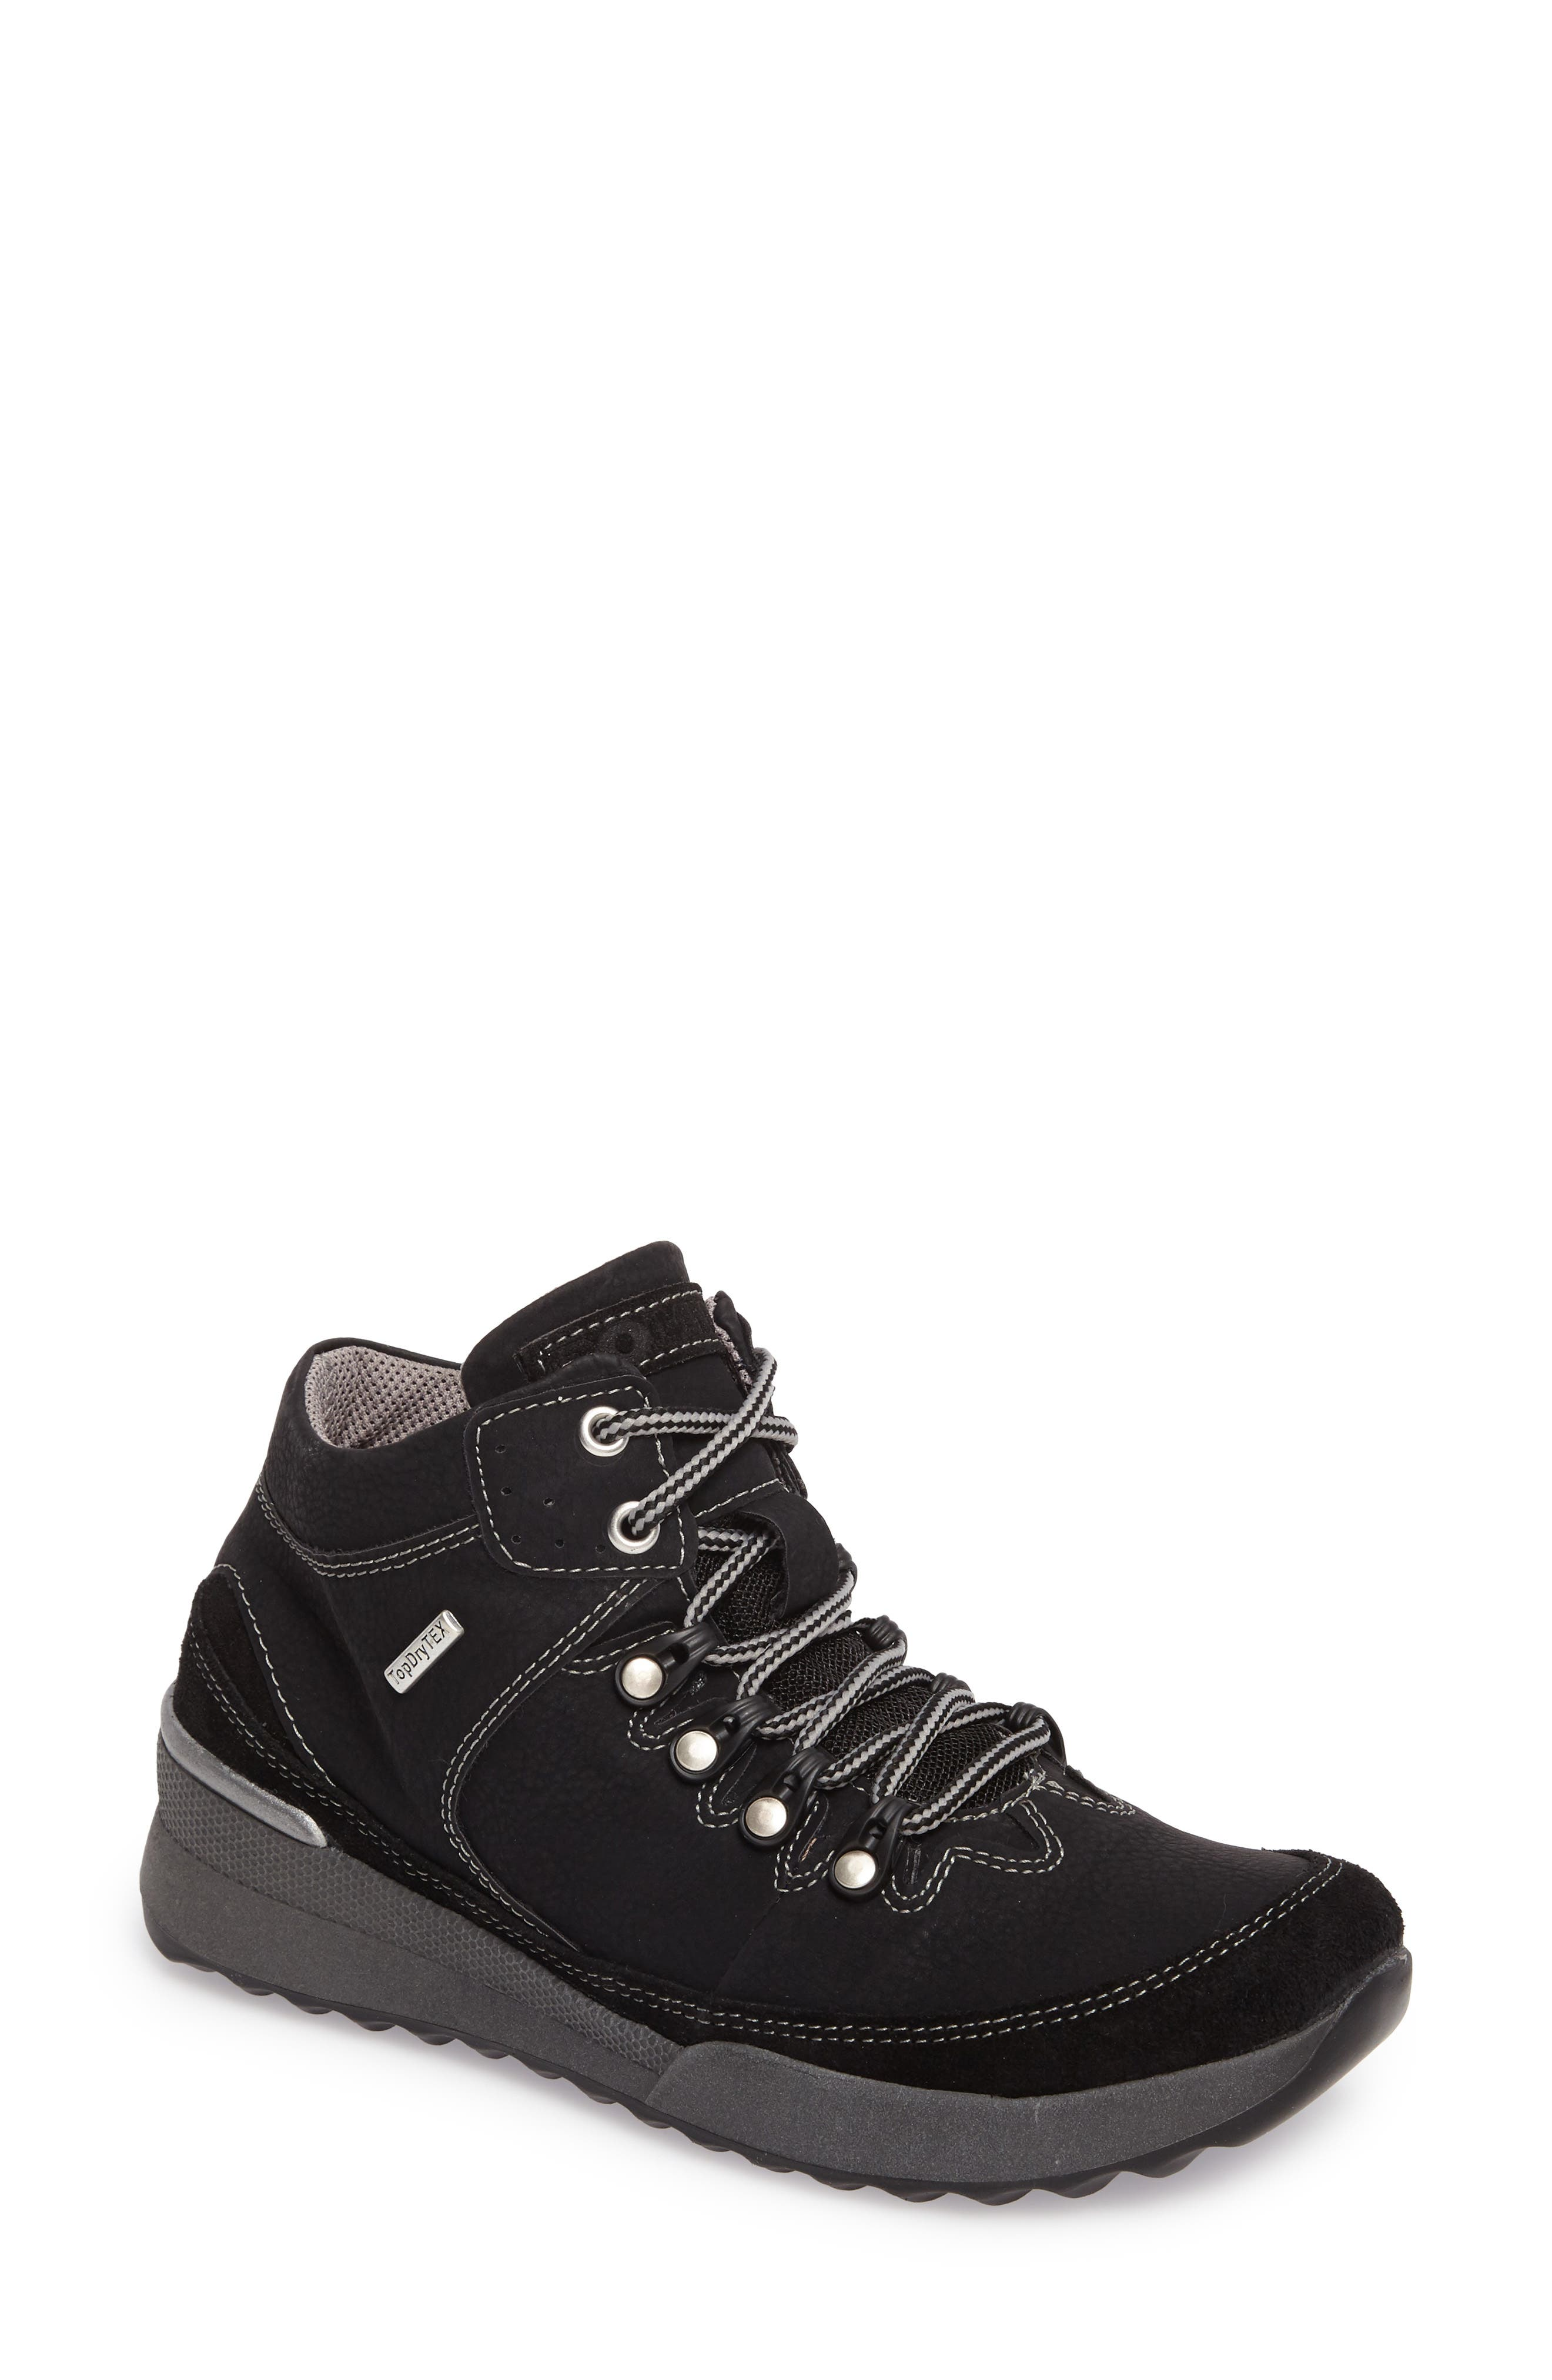 Victoria 05 Waterproof Sneaker,                         Main,                         color, BLACK/ KOMBI LEATHER